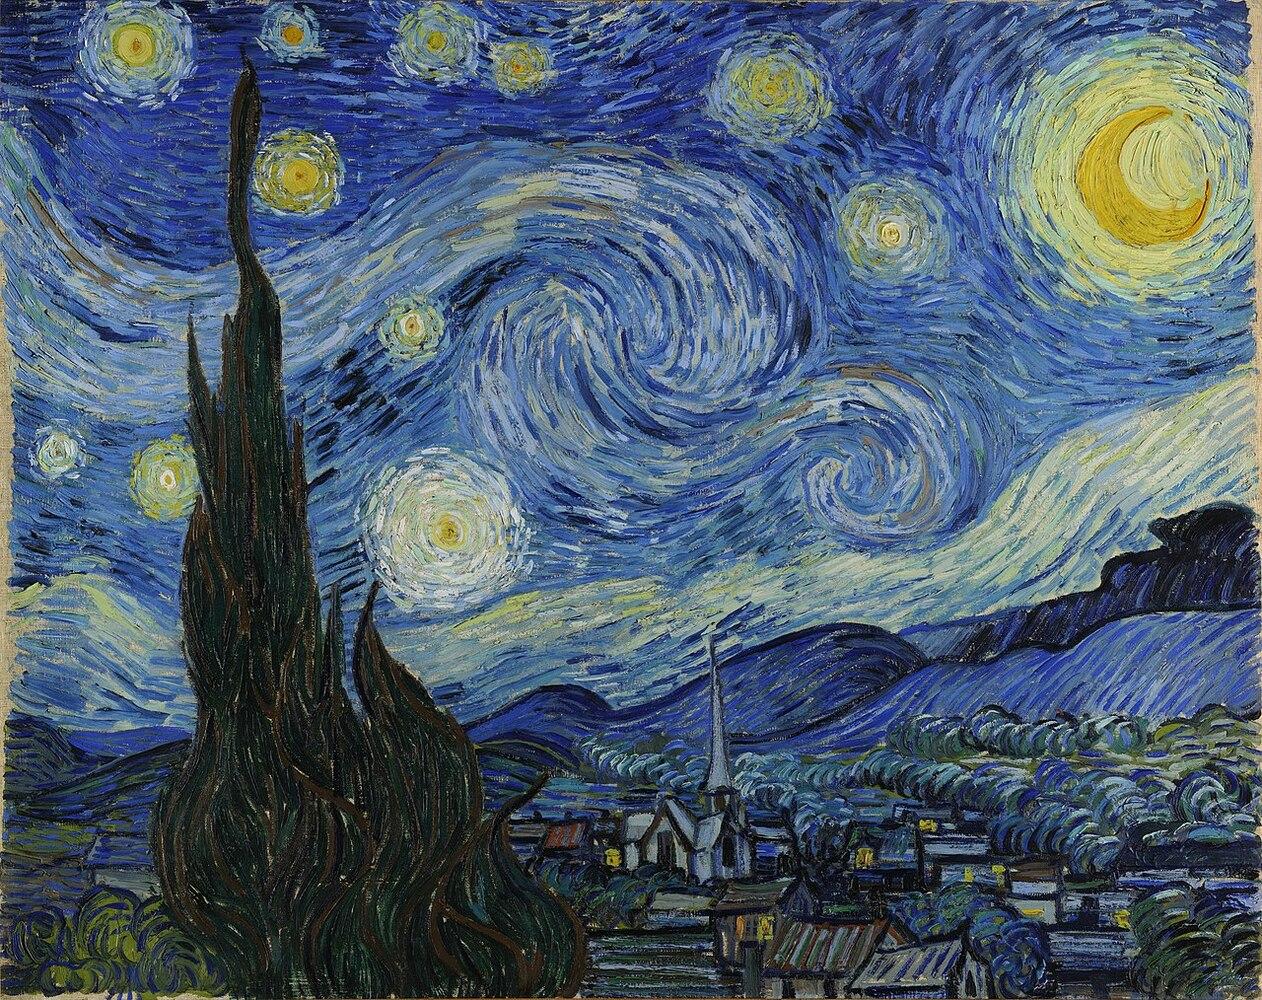 Van Gogh, cuadro